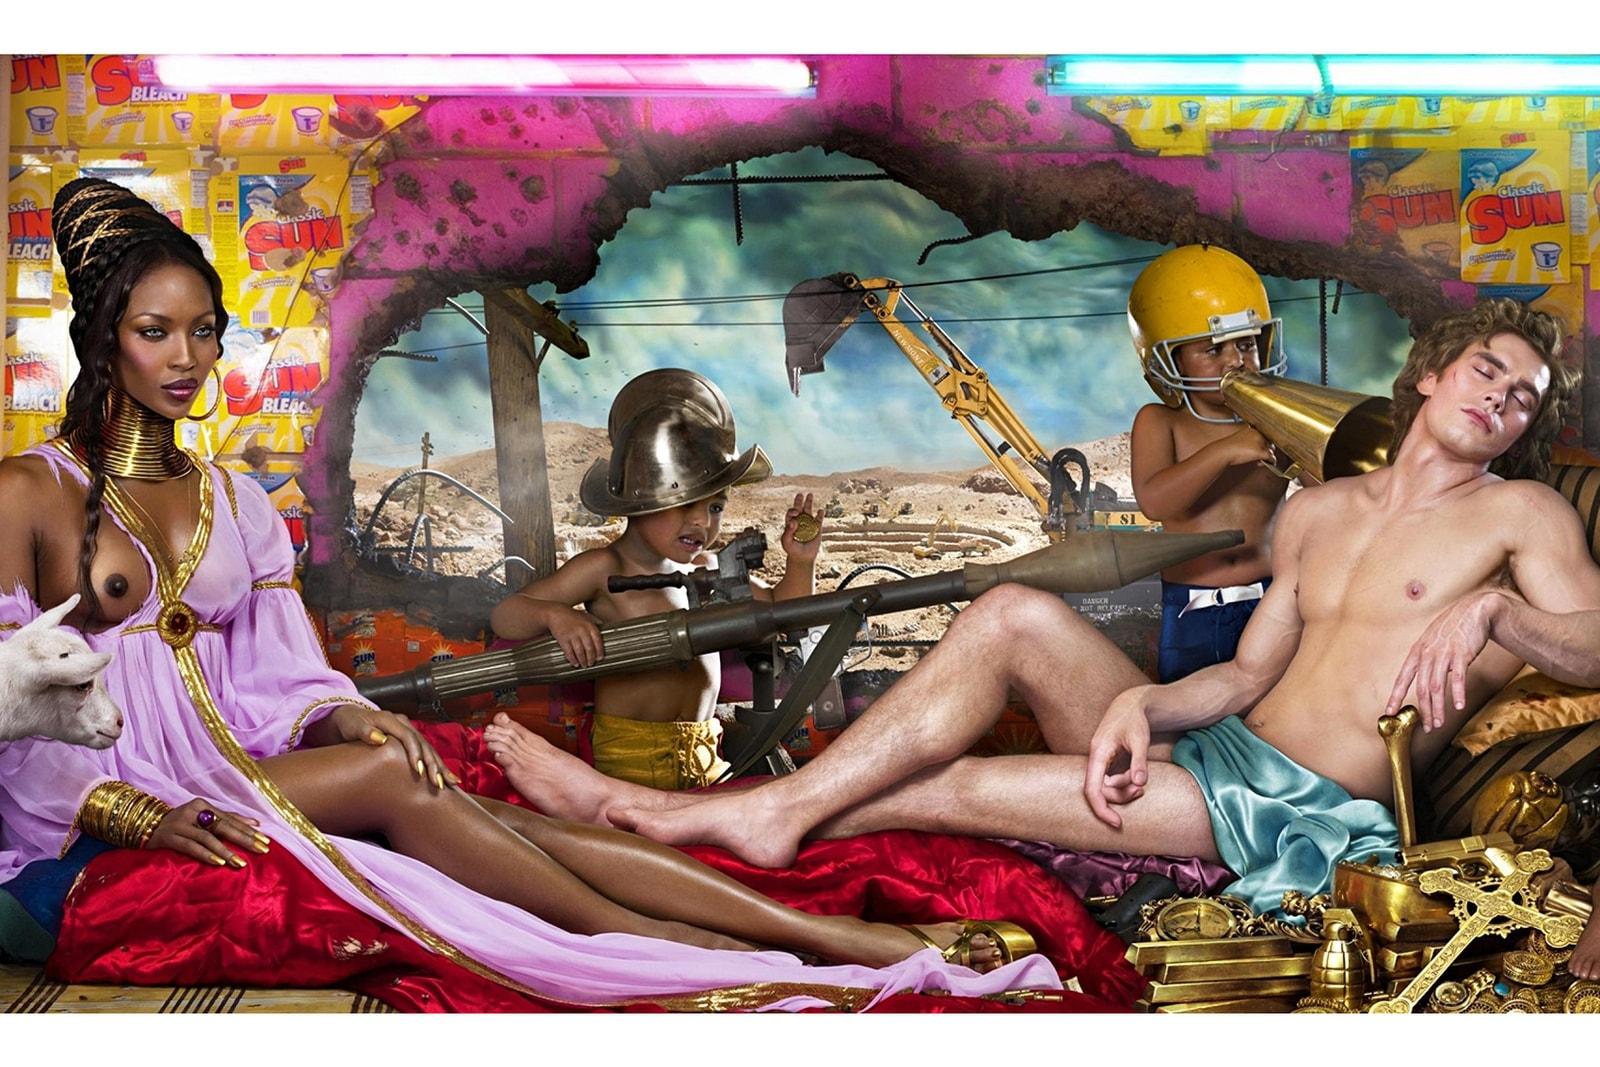 David LaChapelle Travis Scott travail kanye west tupac